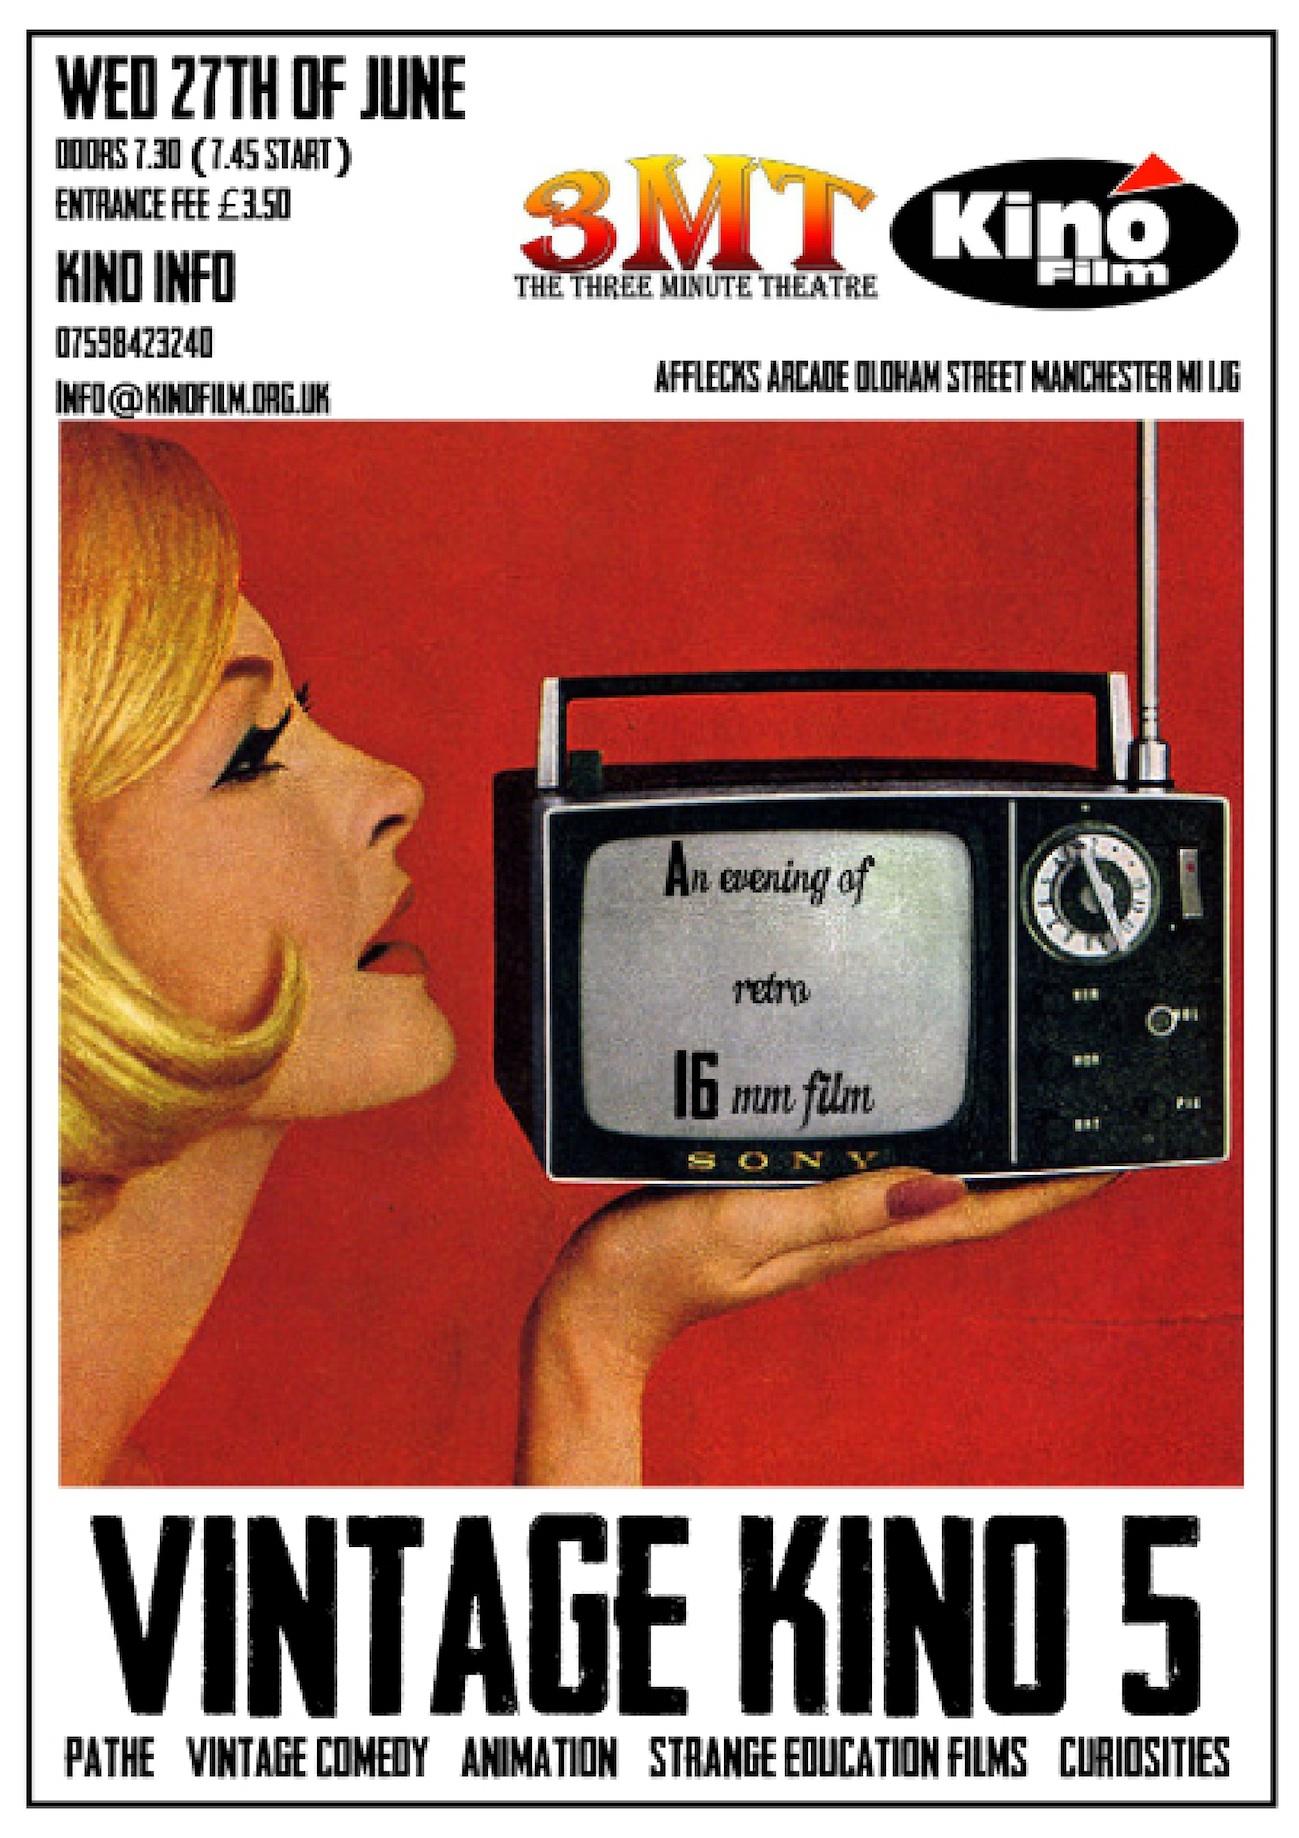 Vintage Kino 5 small